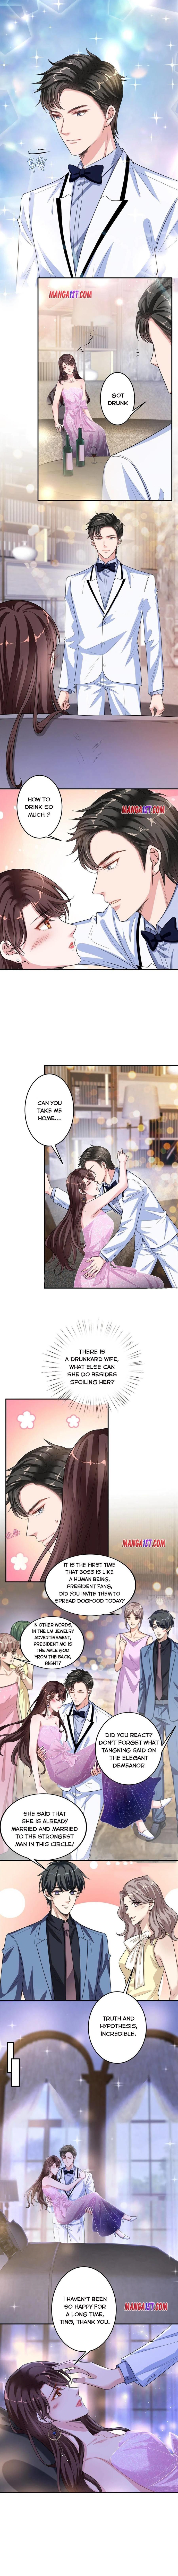 Trial Marriage Husband: Need To Work Hard Chapter 145 page 4 - Mangakakalots.com